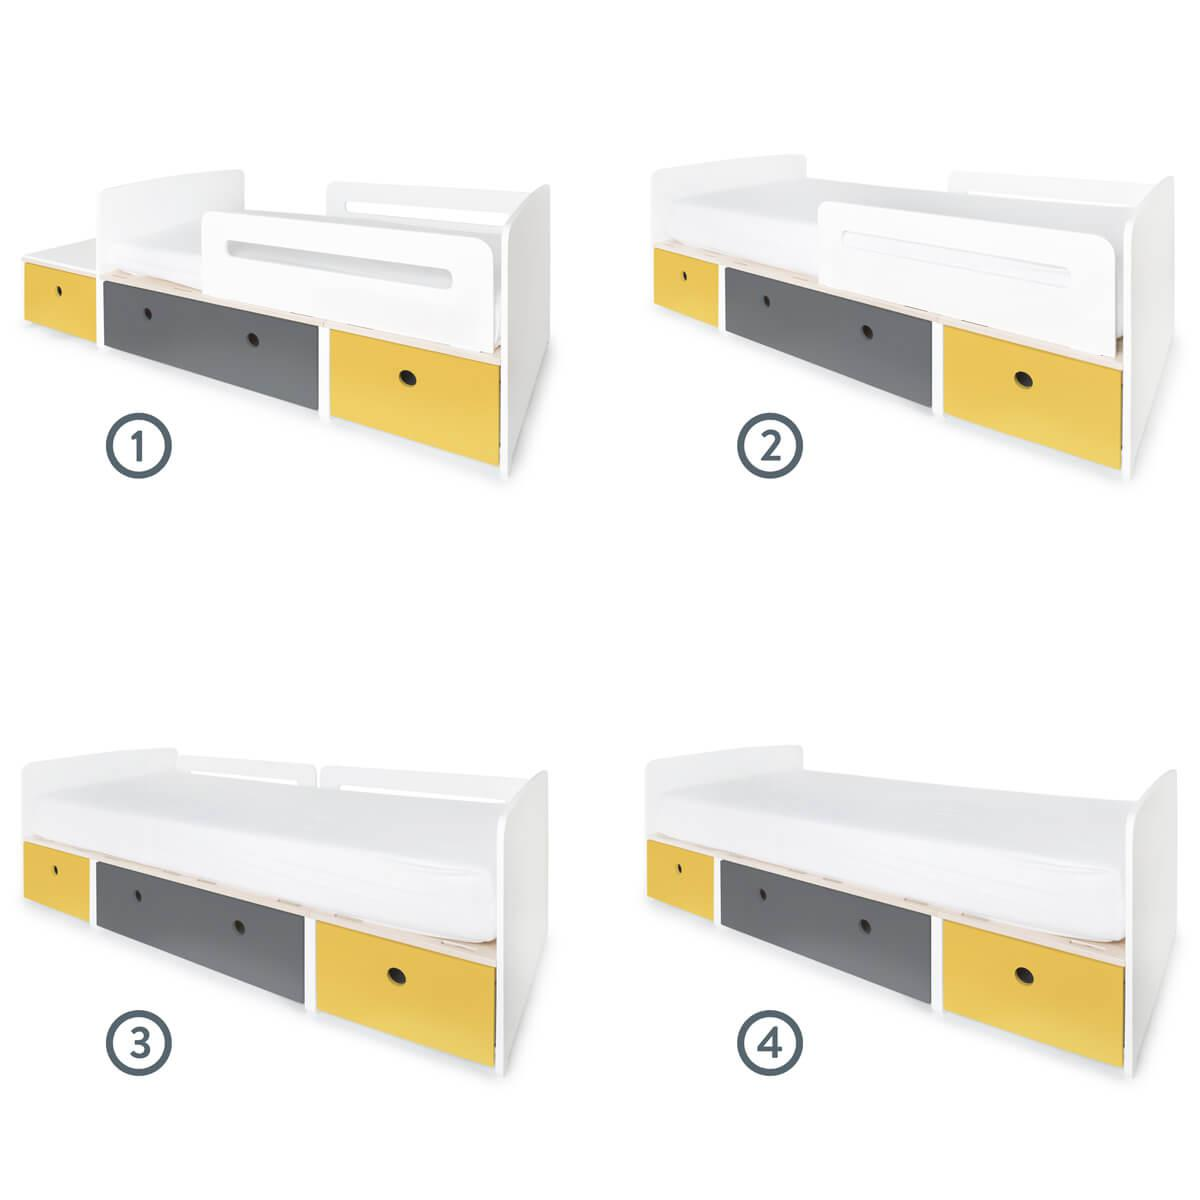 Cama evolutiva infantil 90x150/200cm COLORFLEX nectar yellow-space grey-nectar yellow